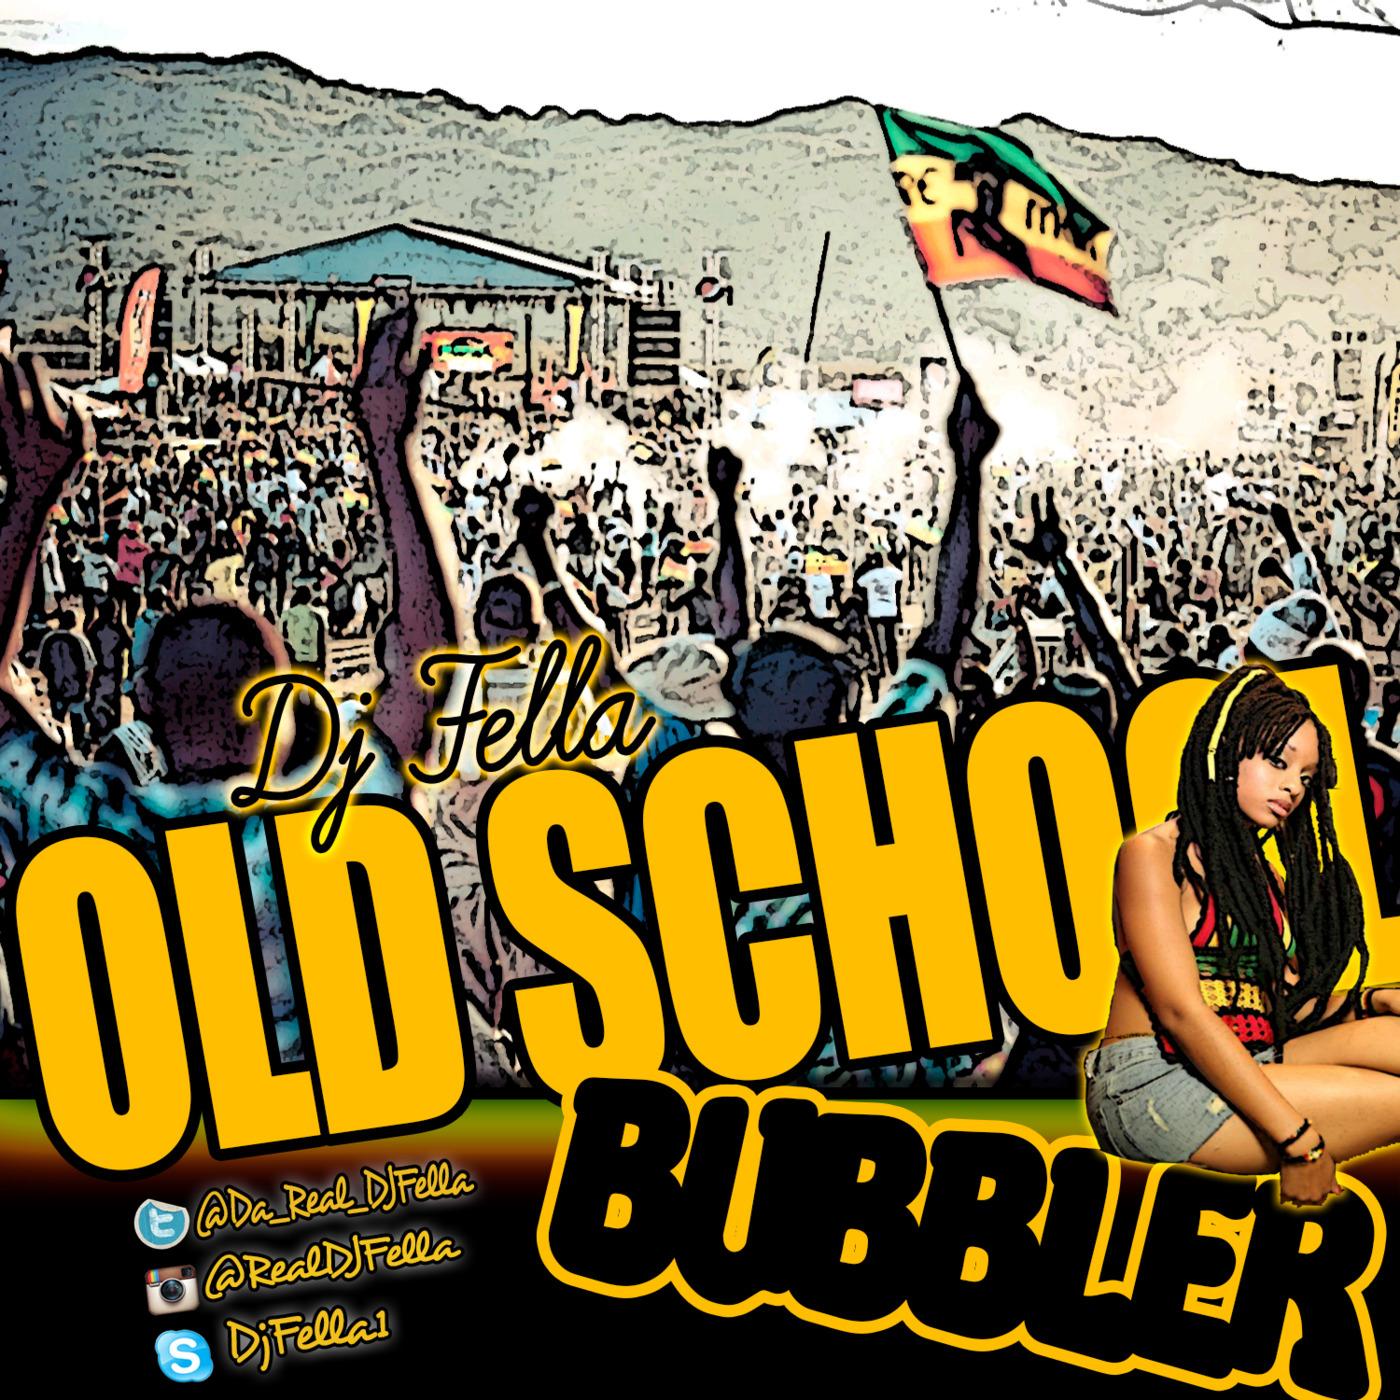 DJ FELLA OLD SCHOOL BUBBLER 2013 Dj Fella's podcast